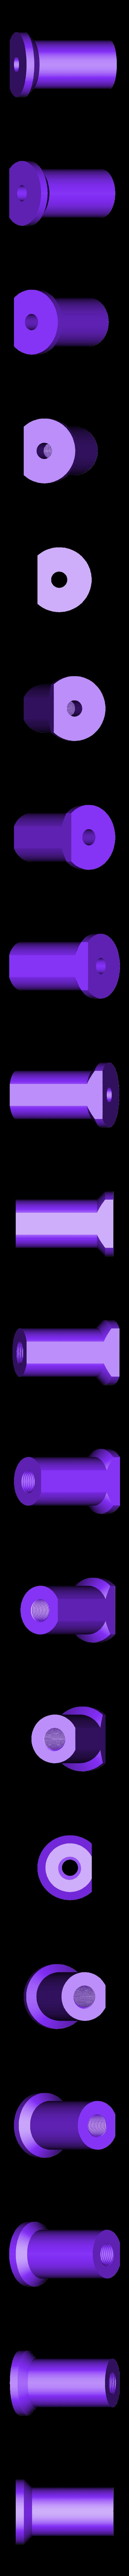 2kg_spool_Part_B.stl Download free STL file Technology Outlet 2kg Spool Mount • 3D printable template, HughMann